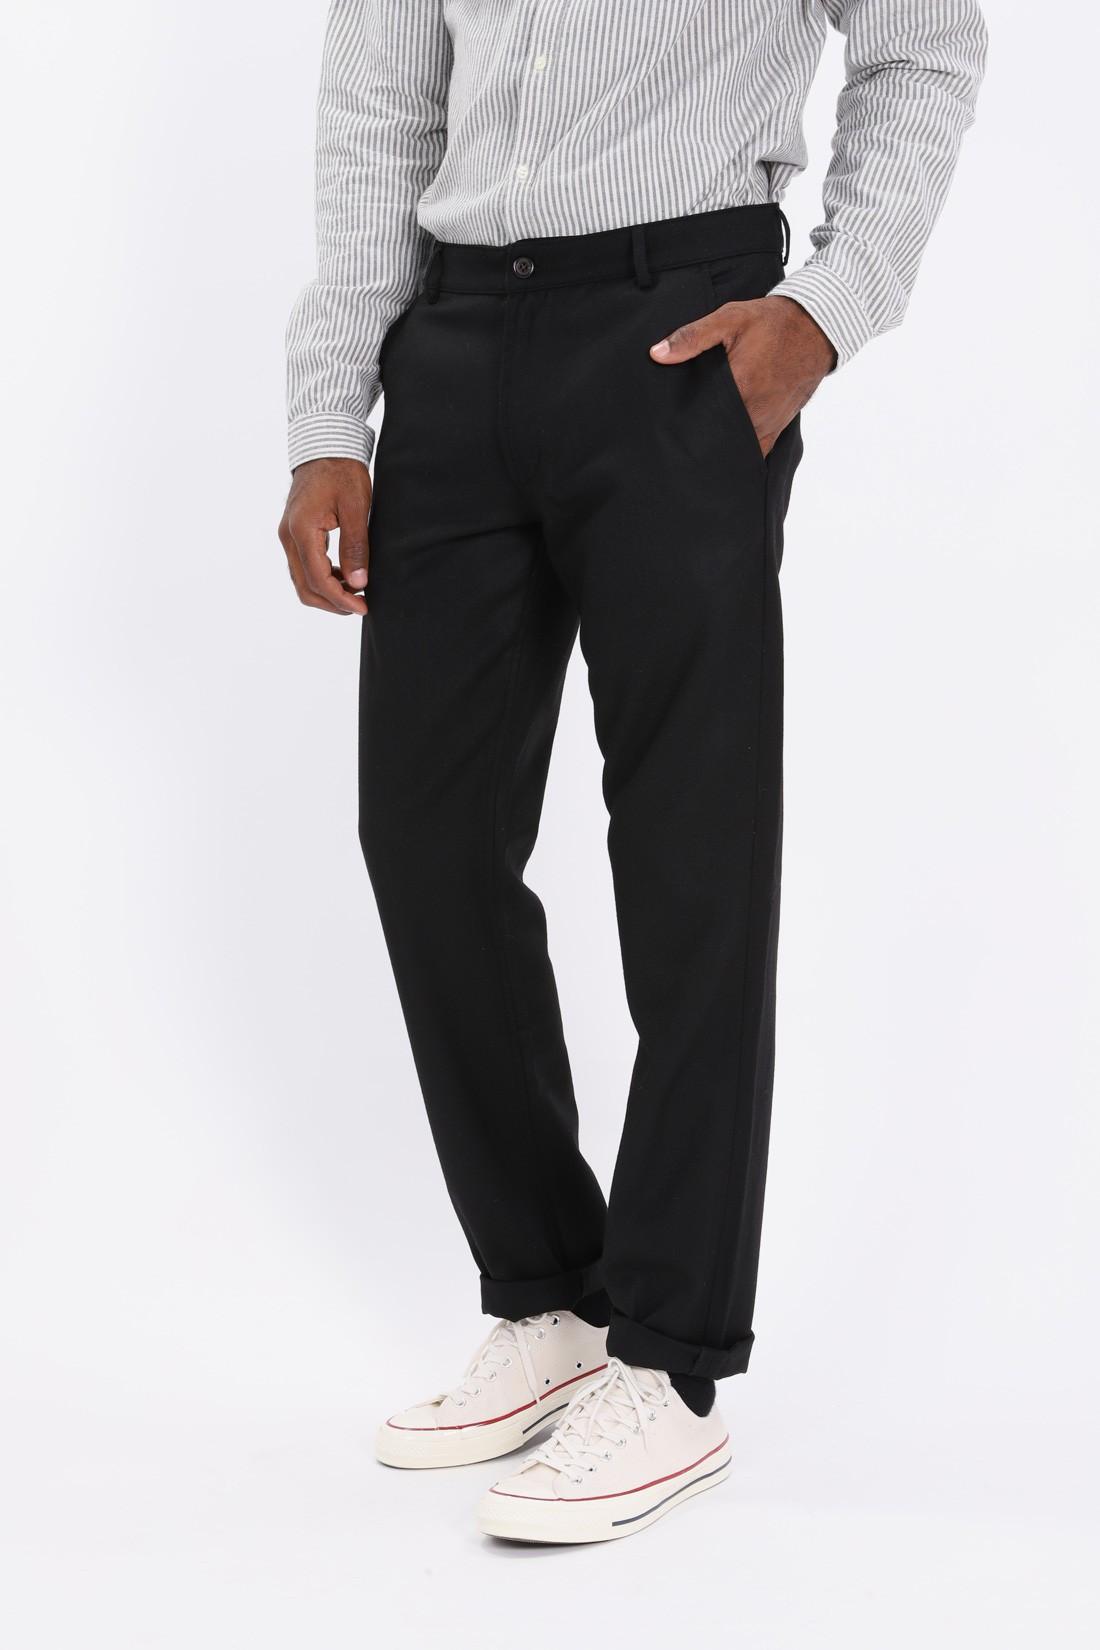 UNIVERSAL WORKS / Aston pant flannel Black